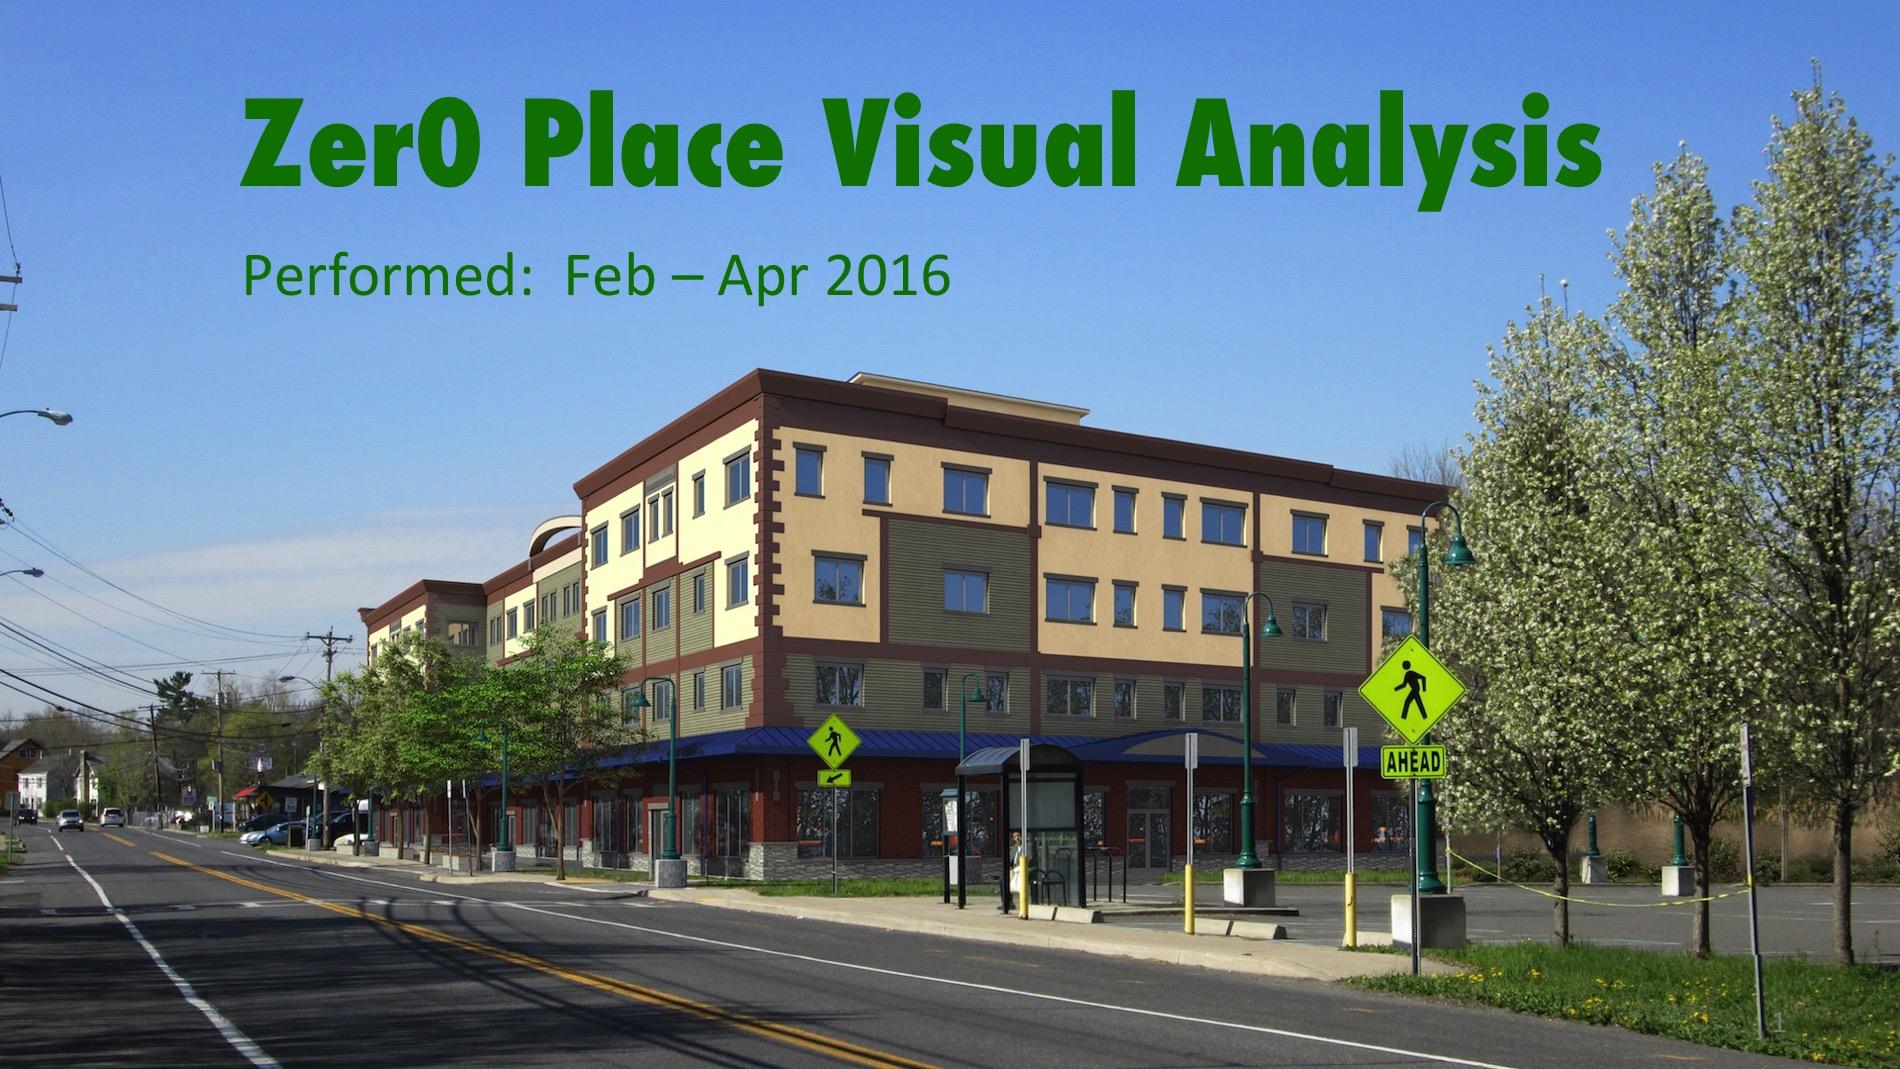 1 Zero Place Visual Analysis.jpg